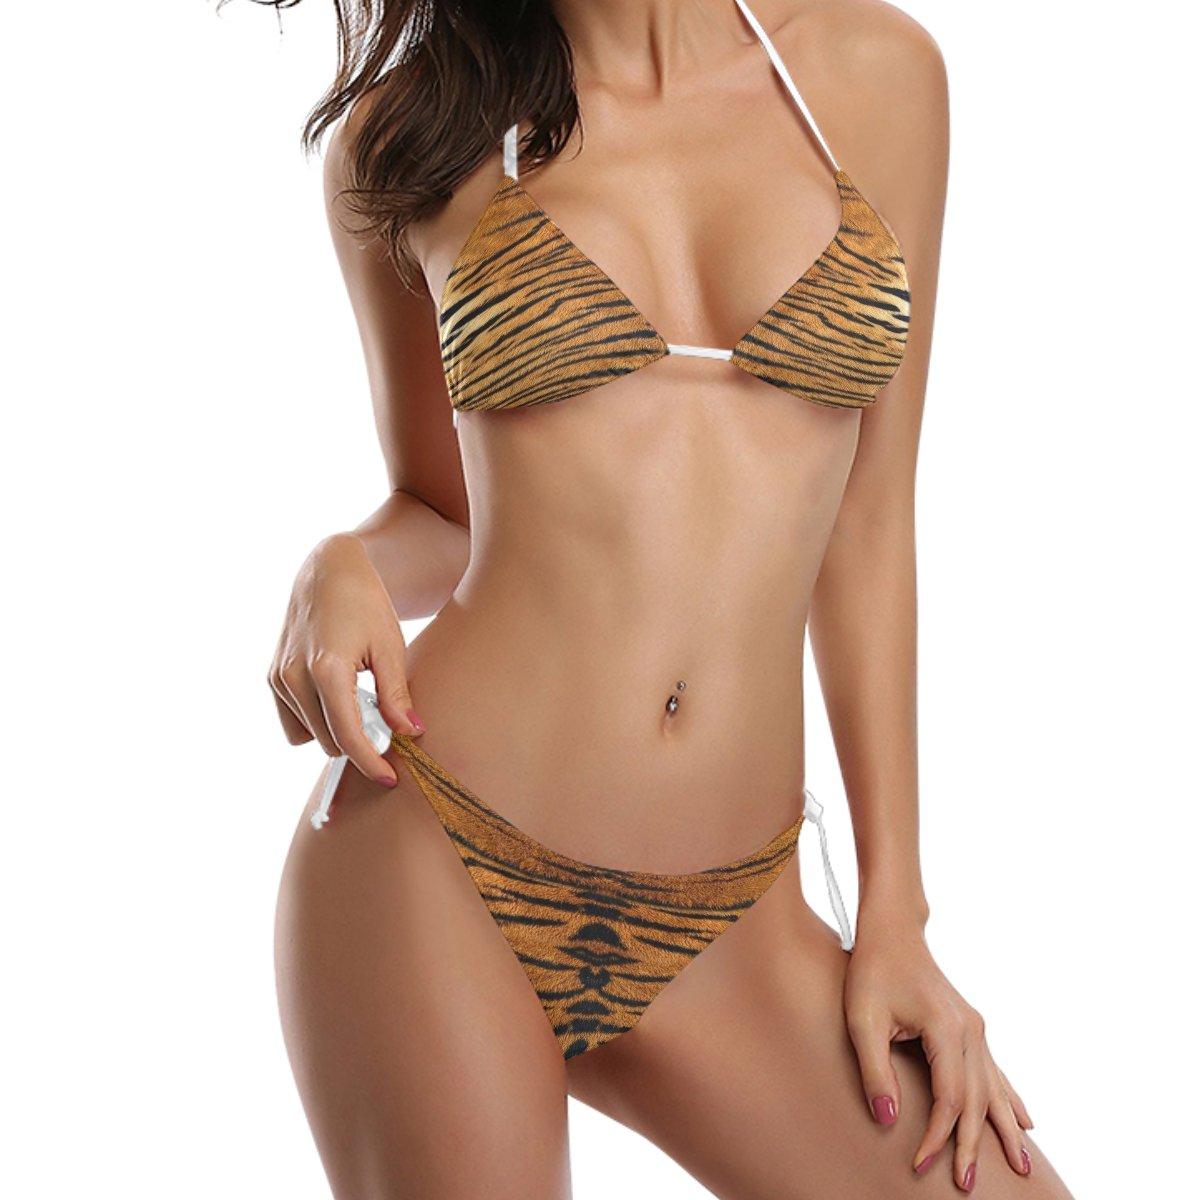 Use7 Tiger Animal Print 2 Piece Swimsuits Bathing Bikini Sets for Women